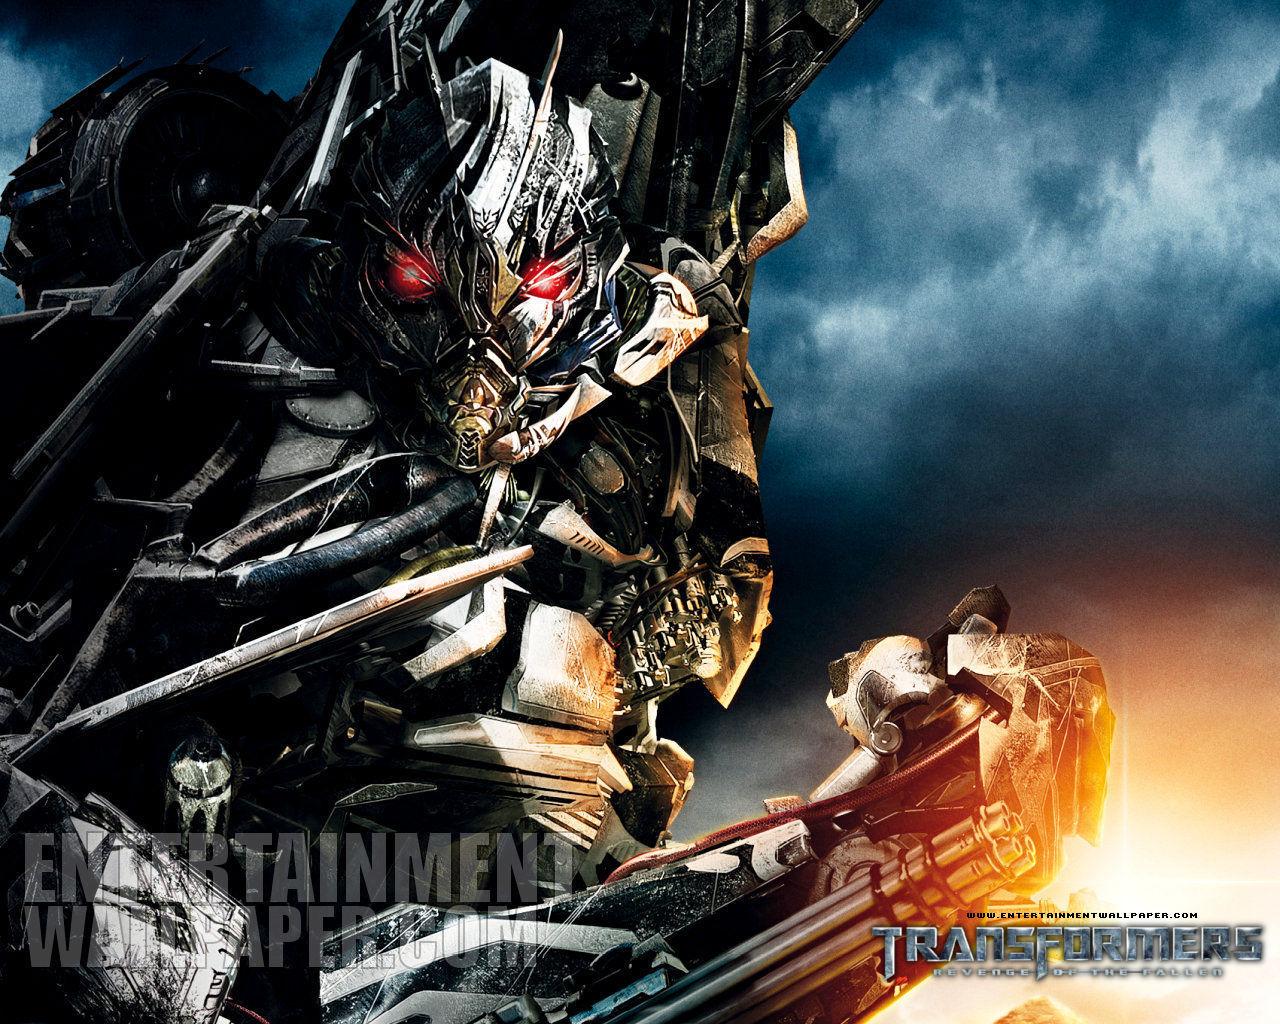 Transformers Revenge Of The Fallen Transformers 2 Wallpaper